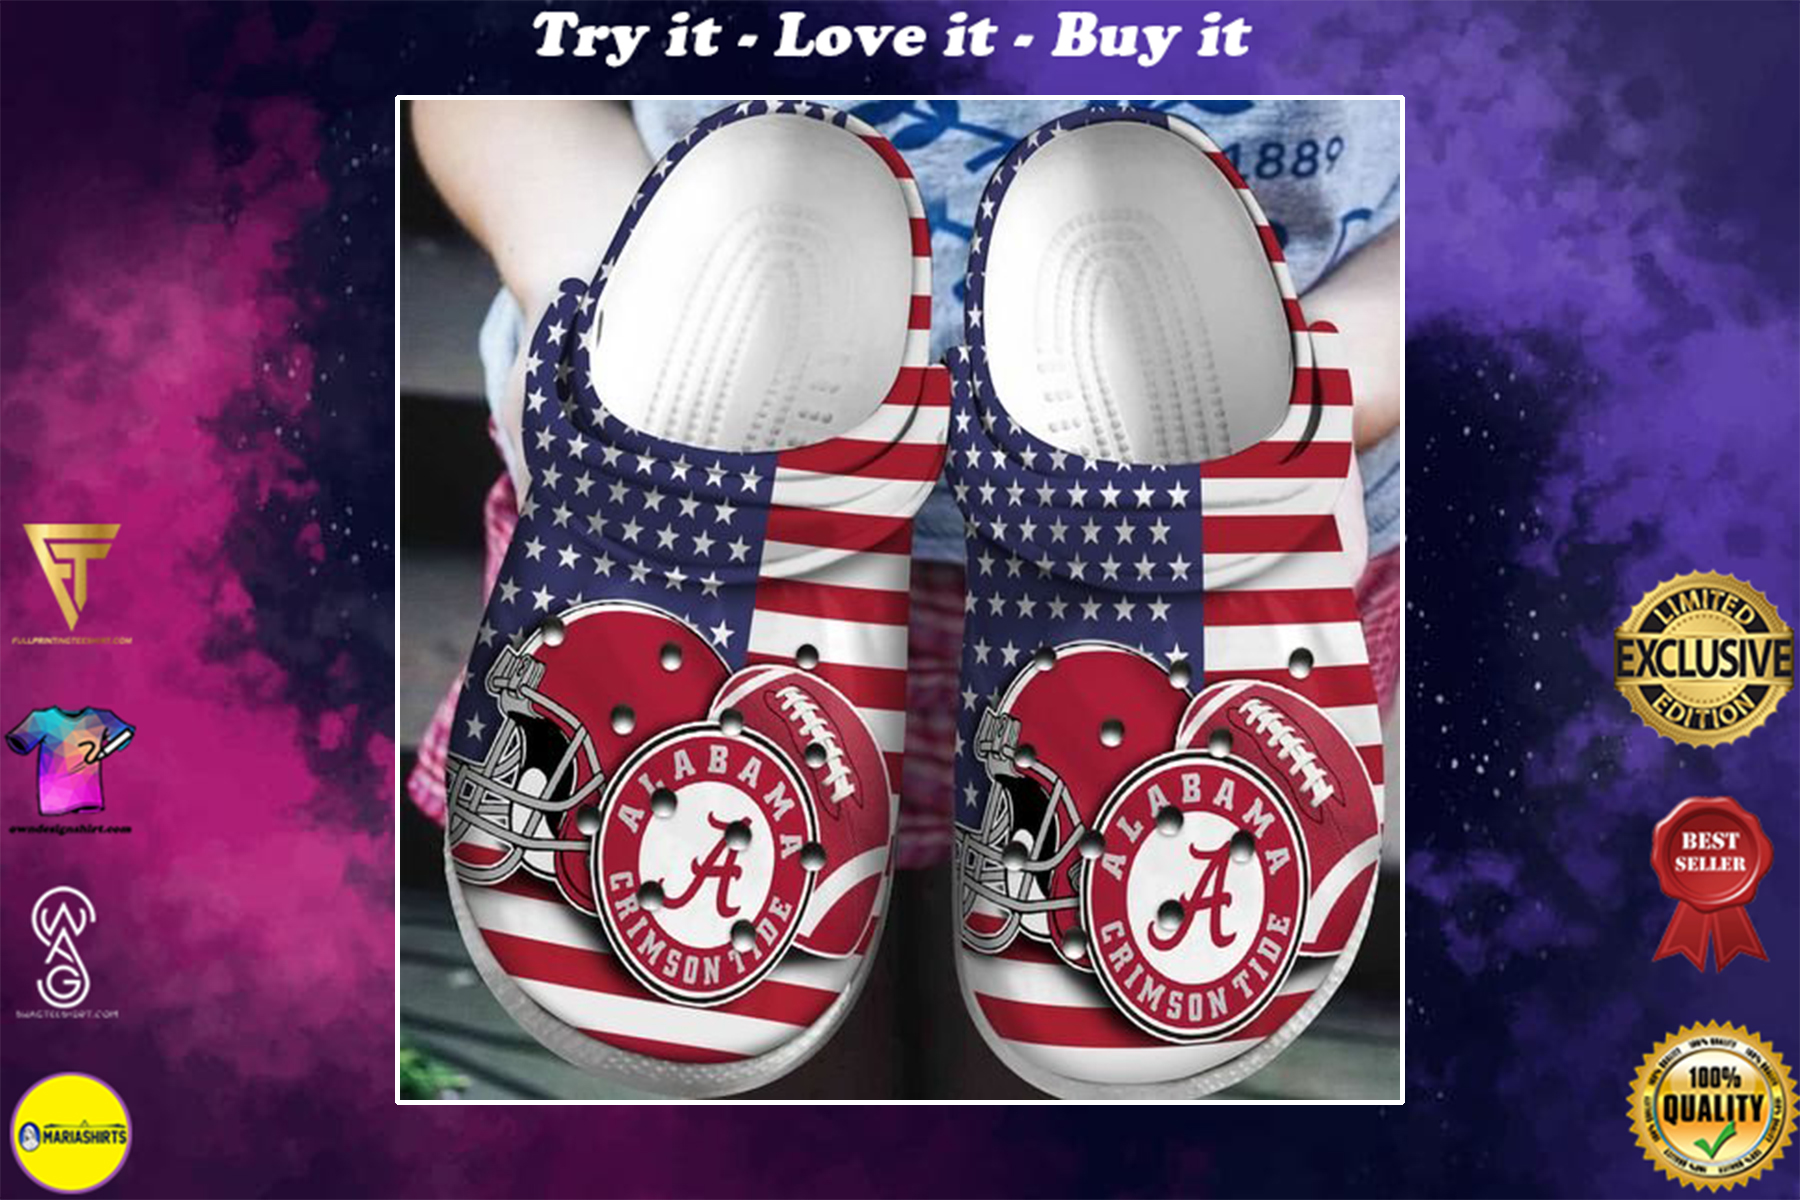 american flag alabama crimson tide football team crocband clog - Copy